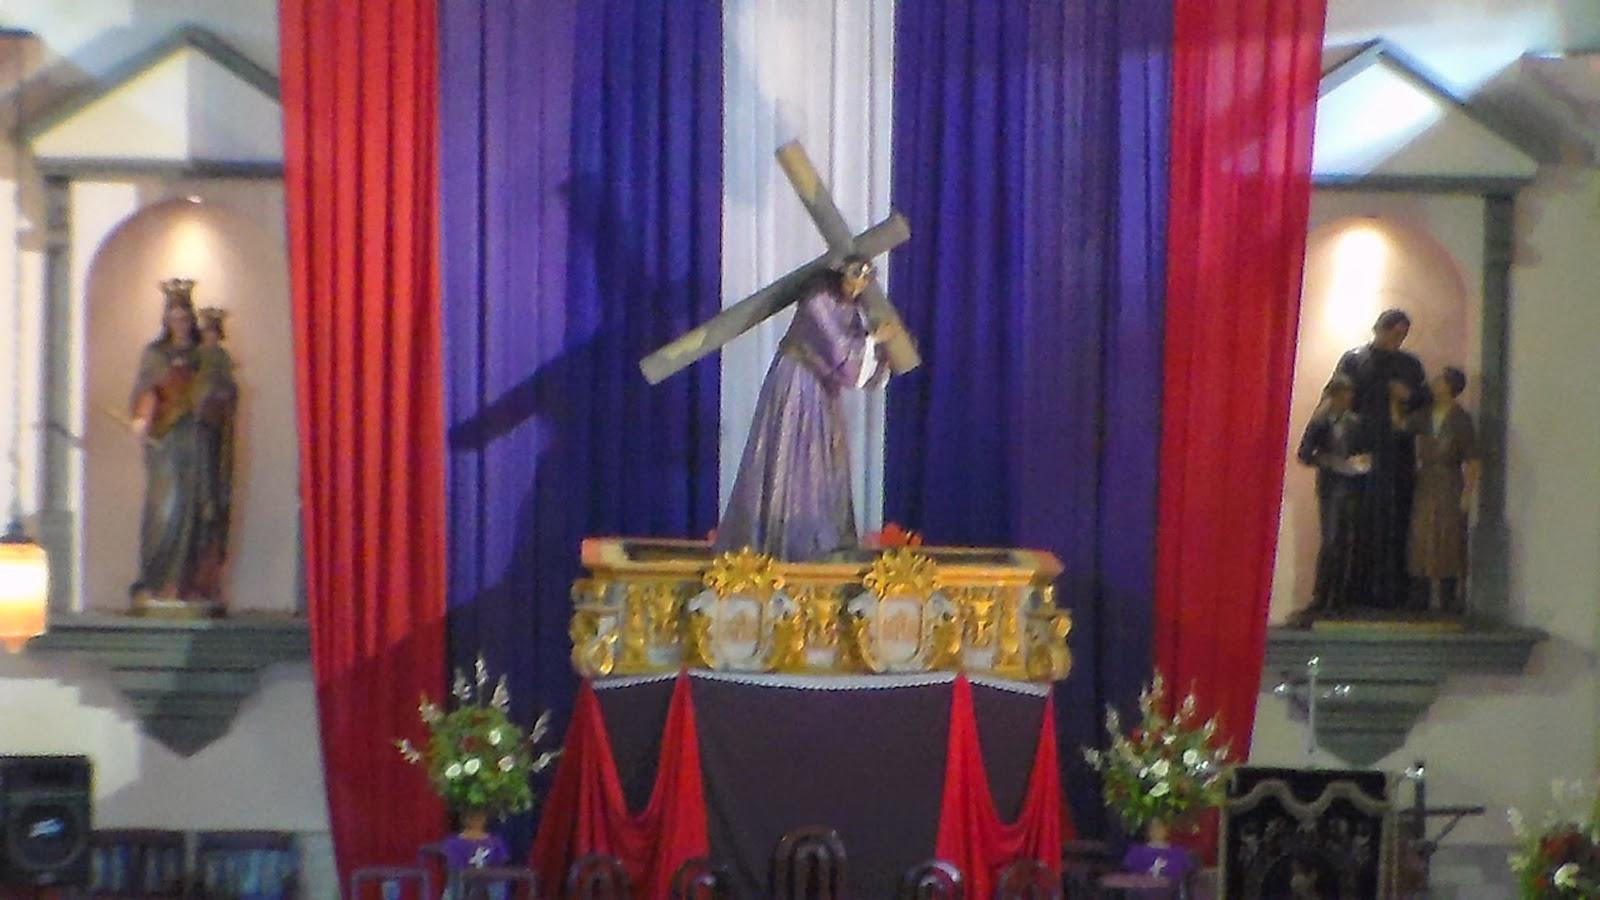 parroquia salesiana divina providencia